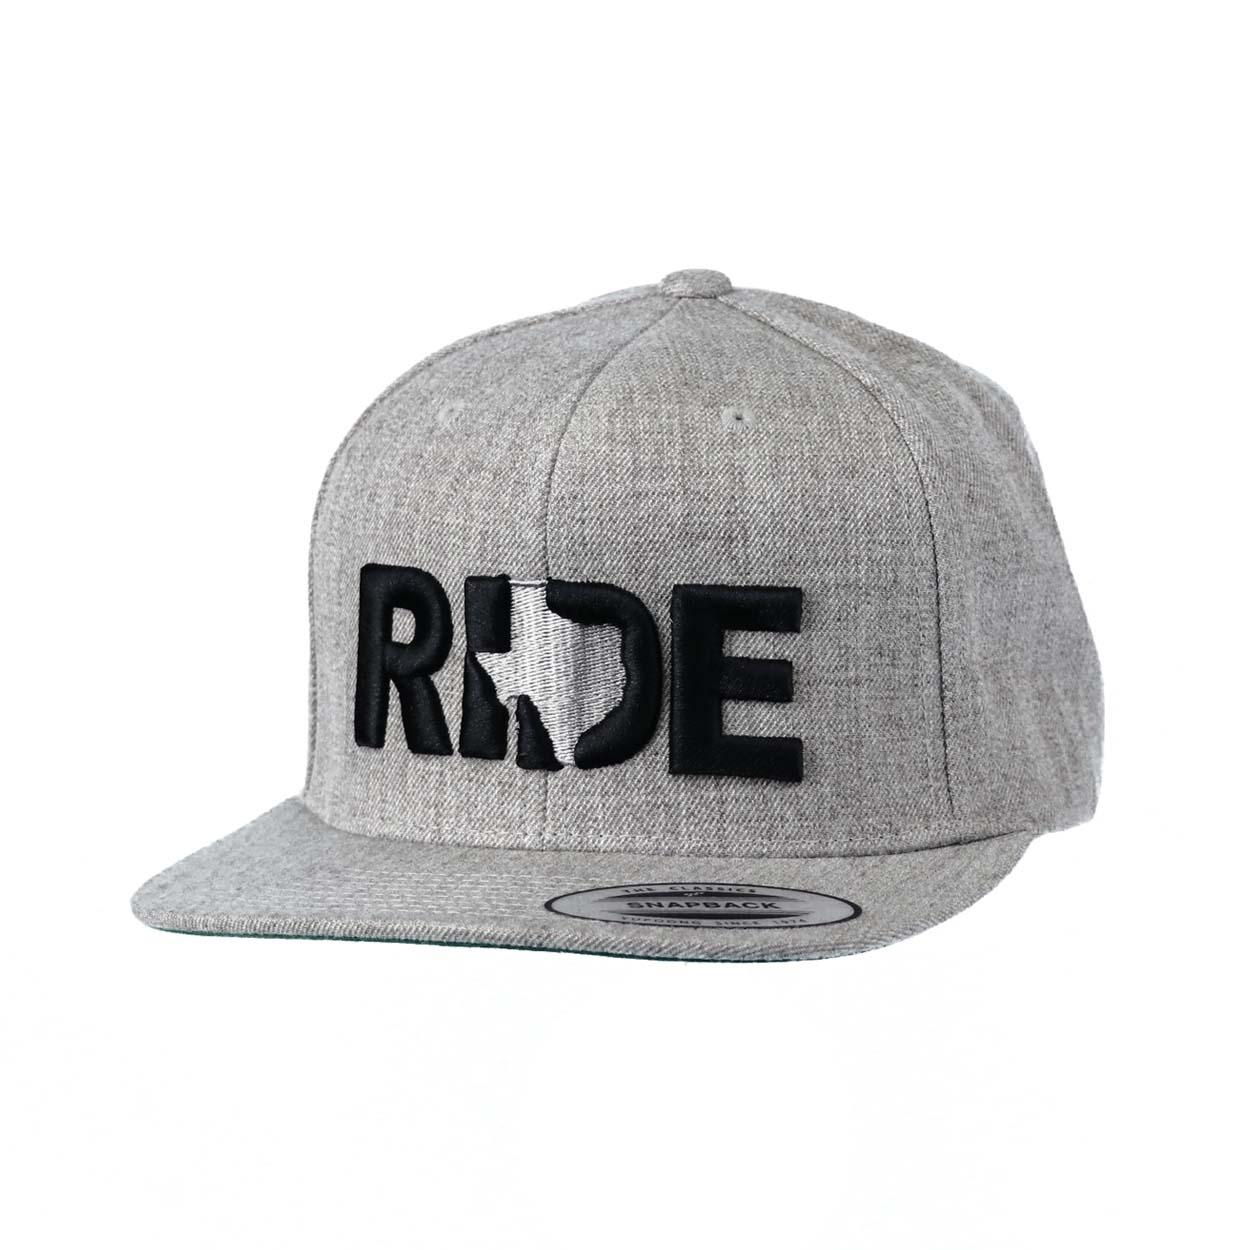 Ride Texas Classic Embroidered Snapback Flat Brim Hat Gray/Black